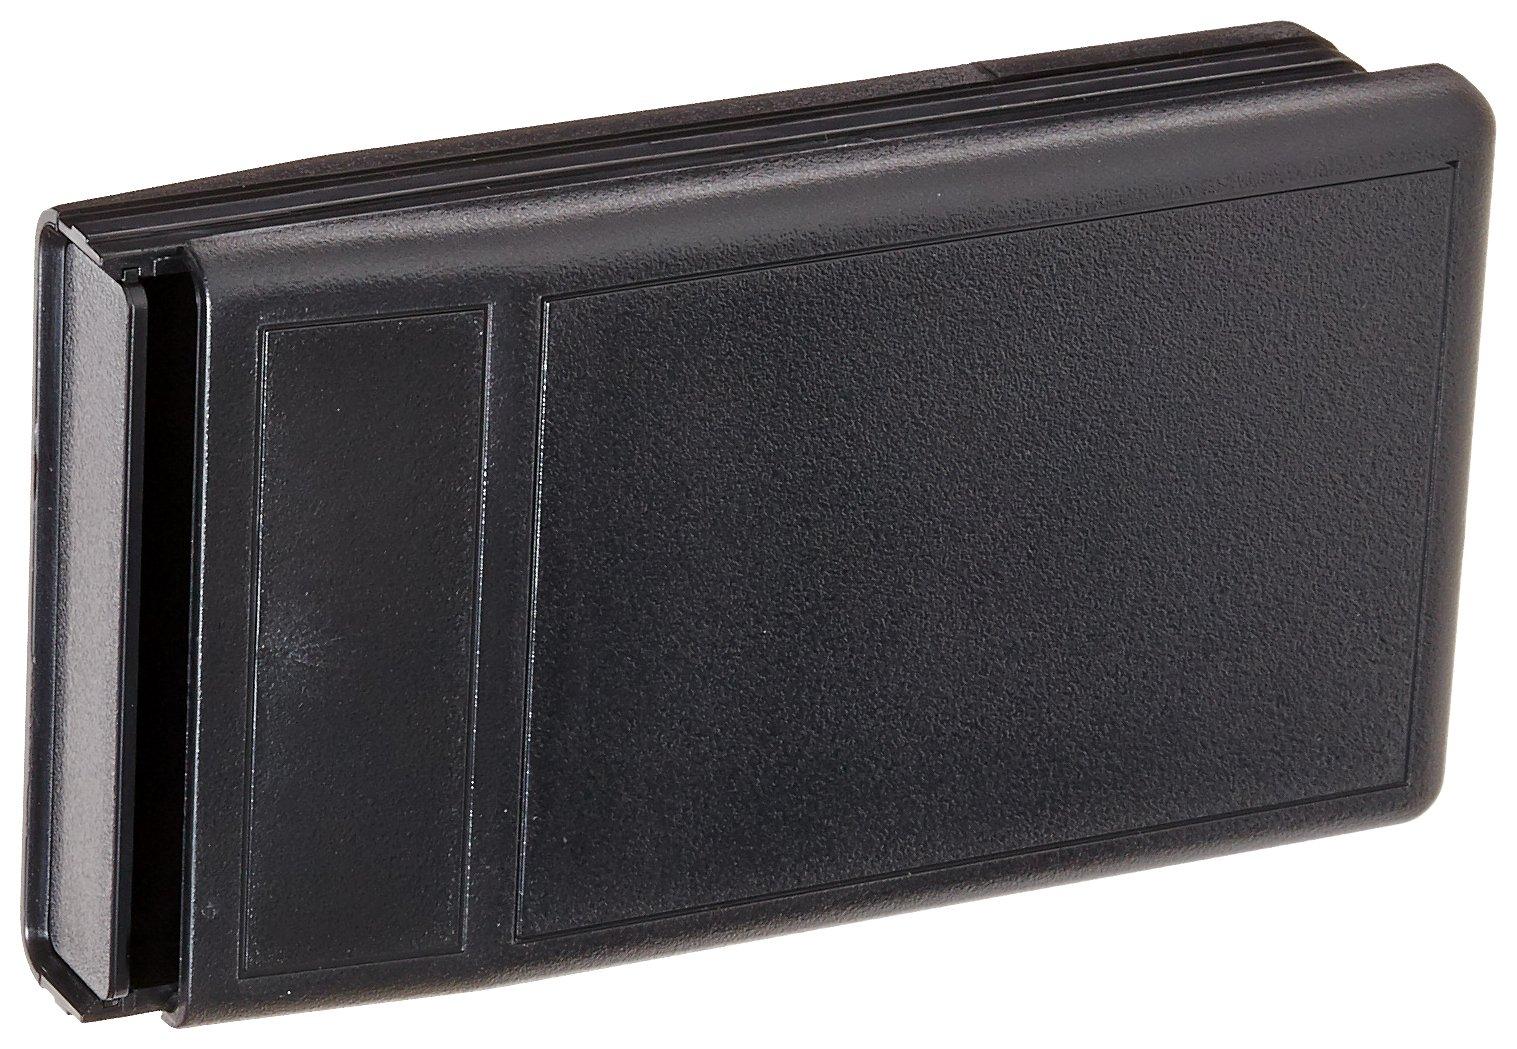 Serpac M6 ABS Plastic Enclosure, 4-5/32'' Length x 2-13/32'' Width x 0.85'' Height, Black